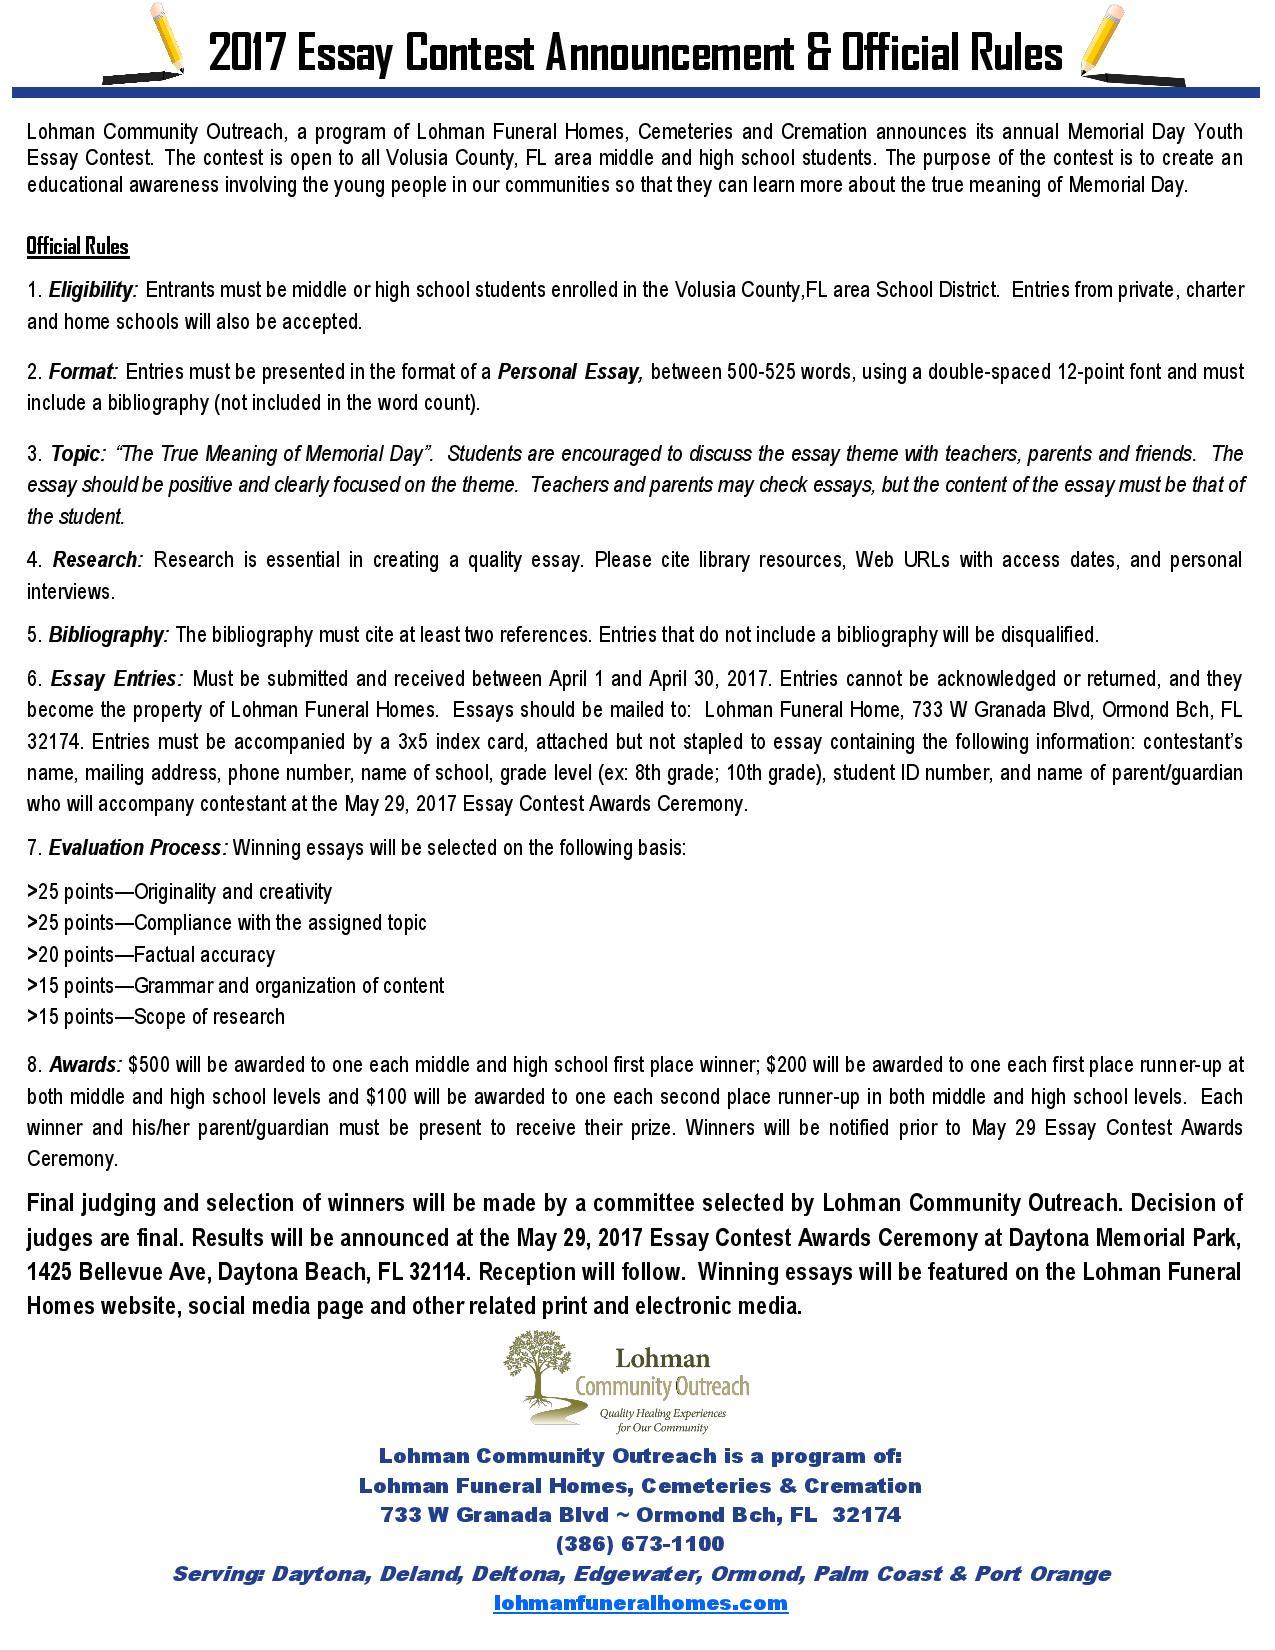 DirectTextbook High School Senior Scholarship Essay Contest | Scholarships for College